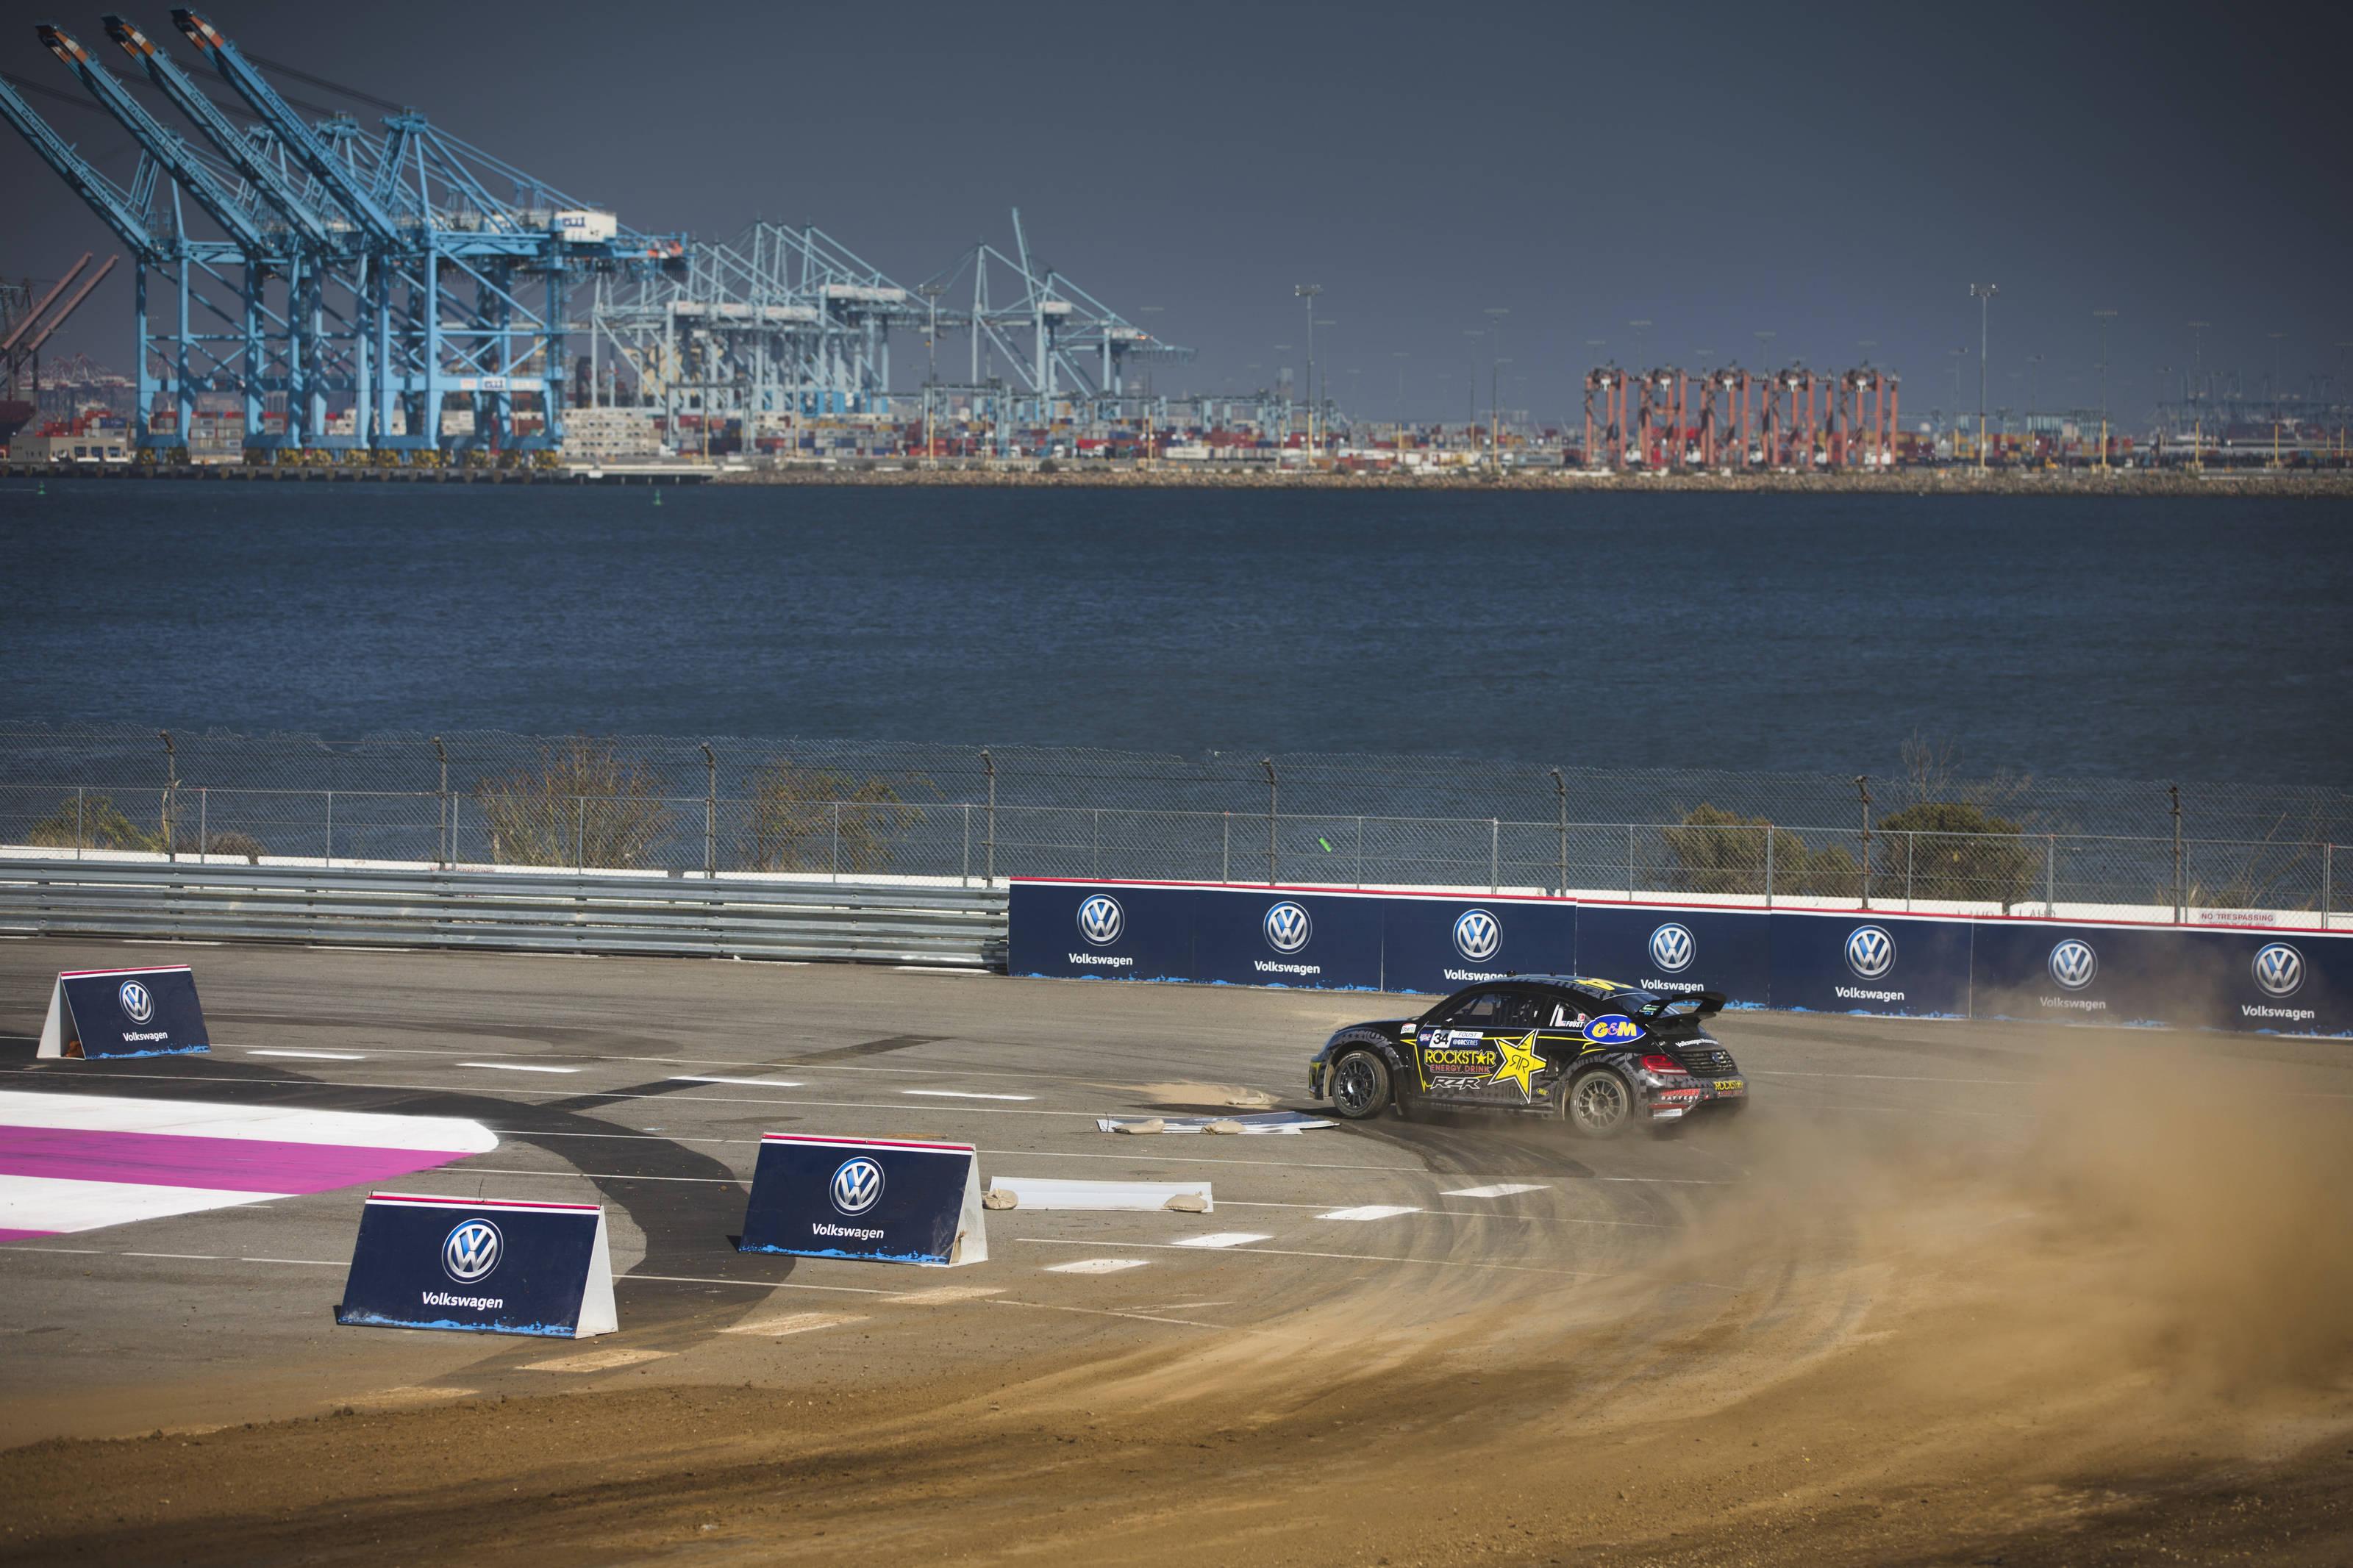 Scott Speed Wins Third Straight Red Bull Global Rallycross Title